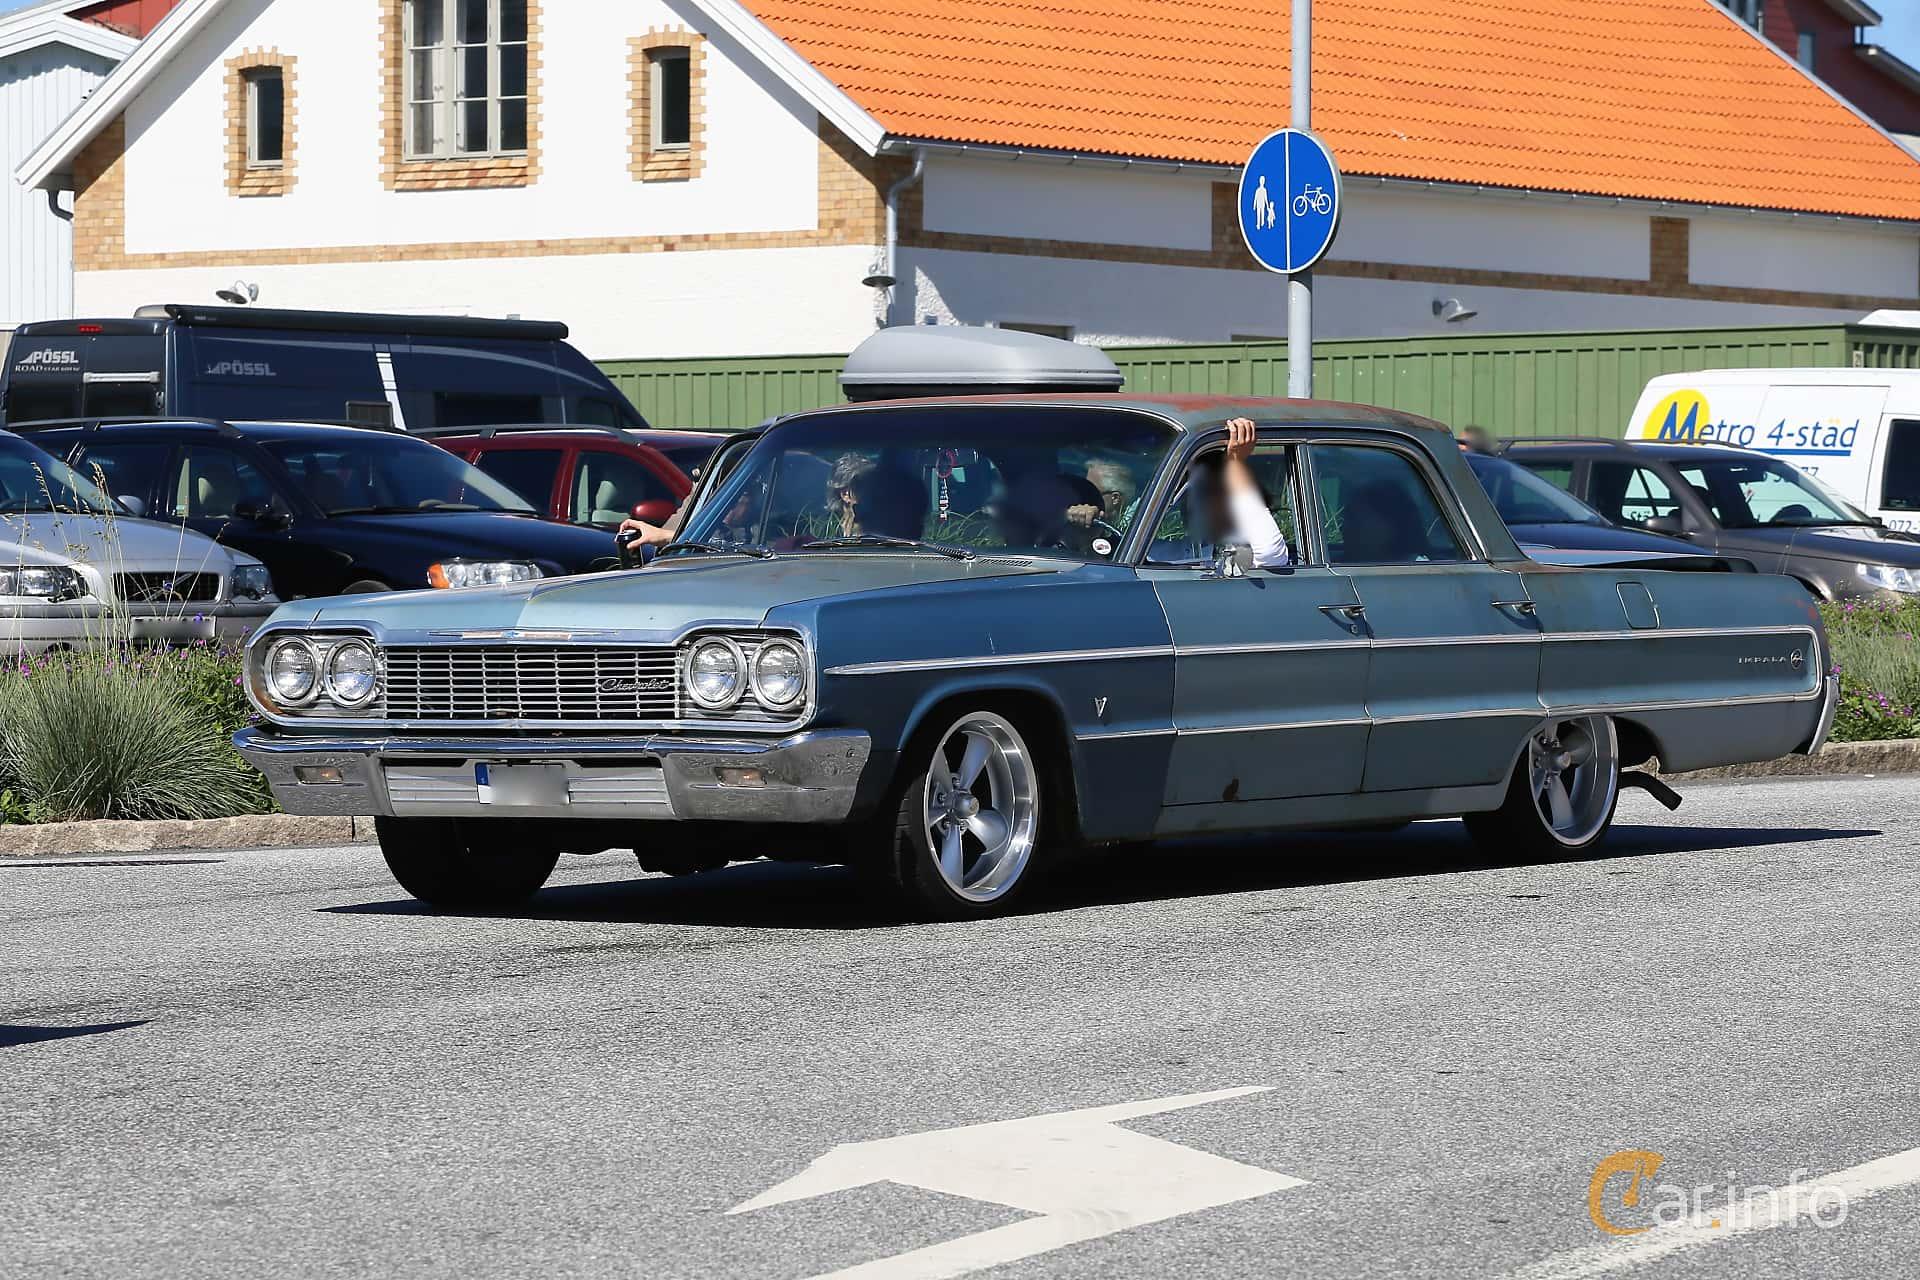 Chevrolet Impala Sedan 4.6 V8 Powerglide, 198hp, 1964 at Cruising Lysekil 2019